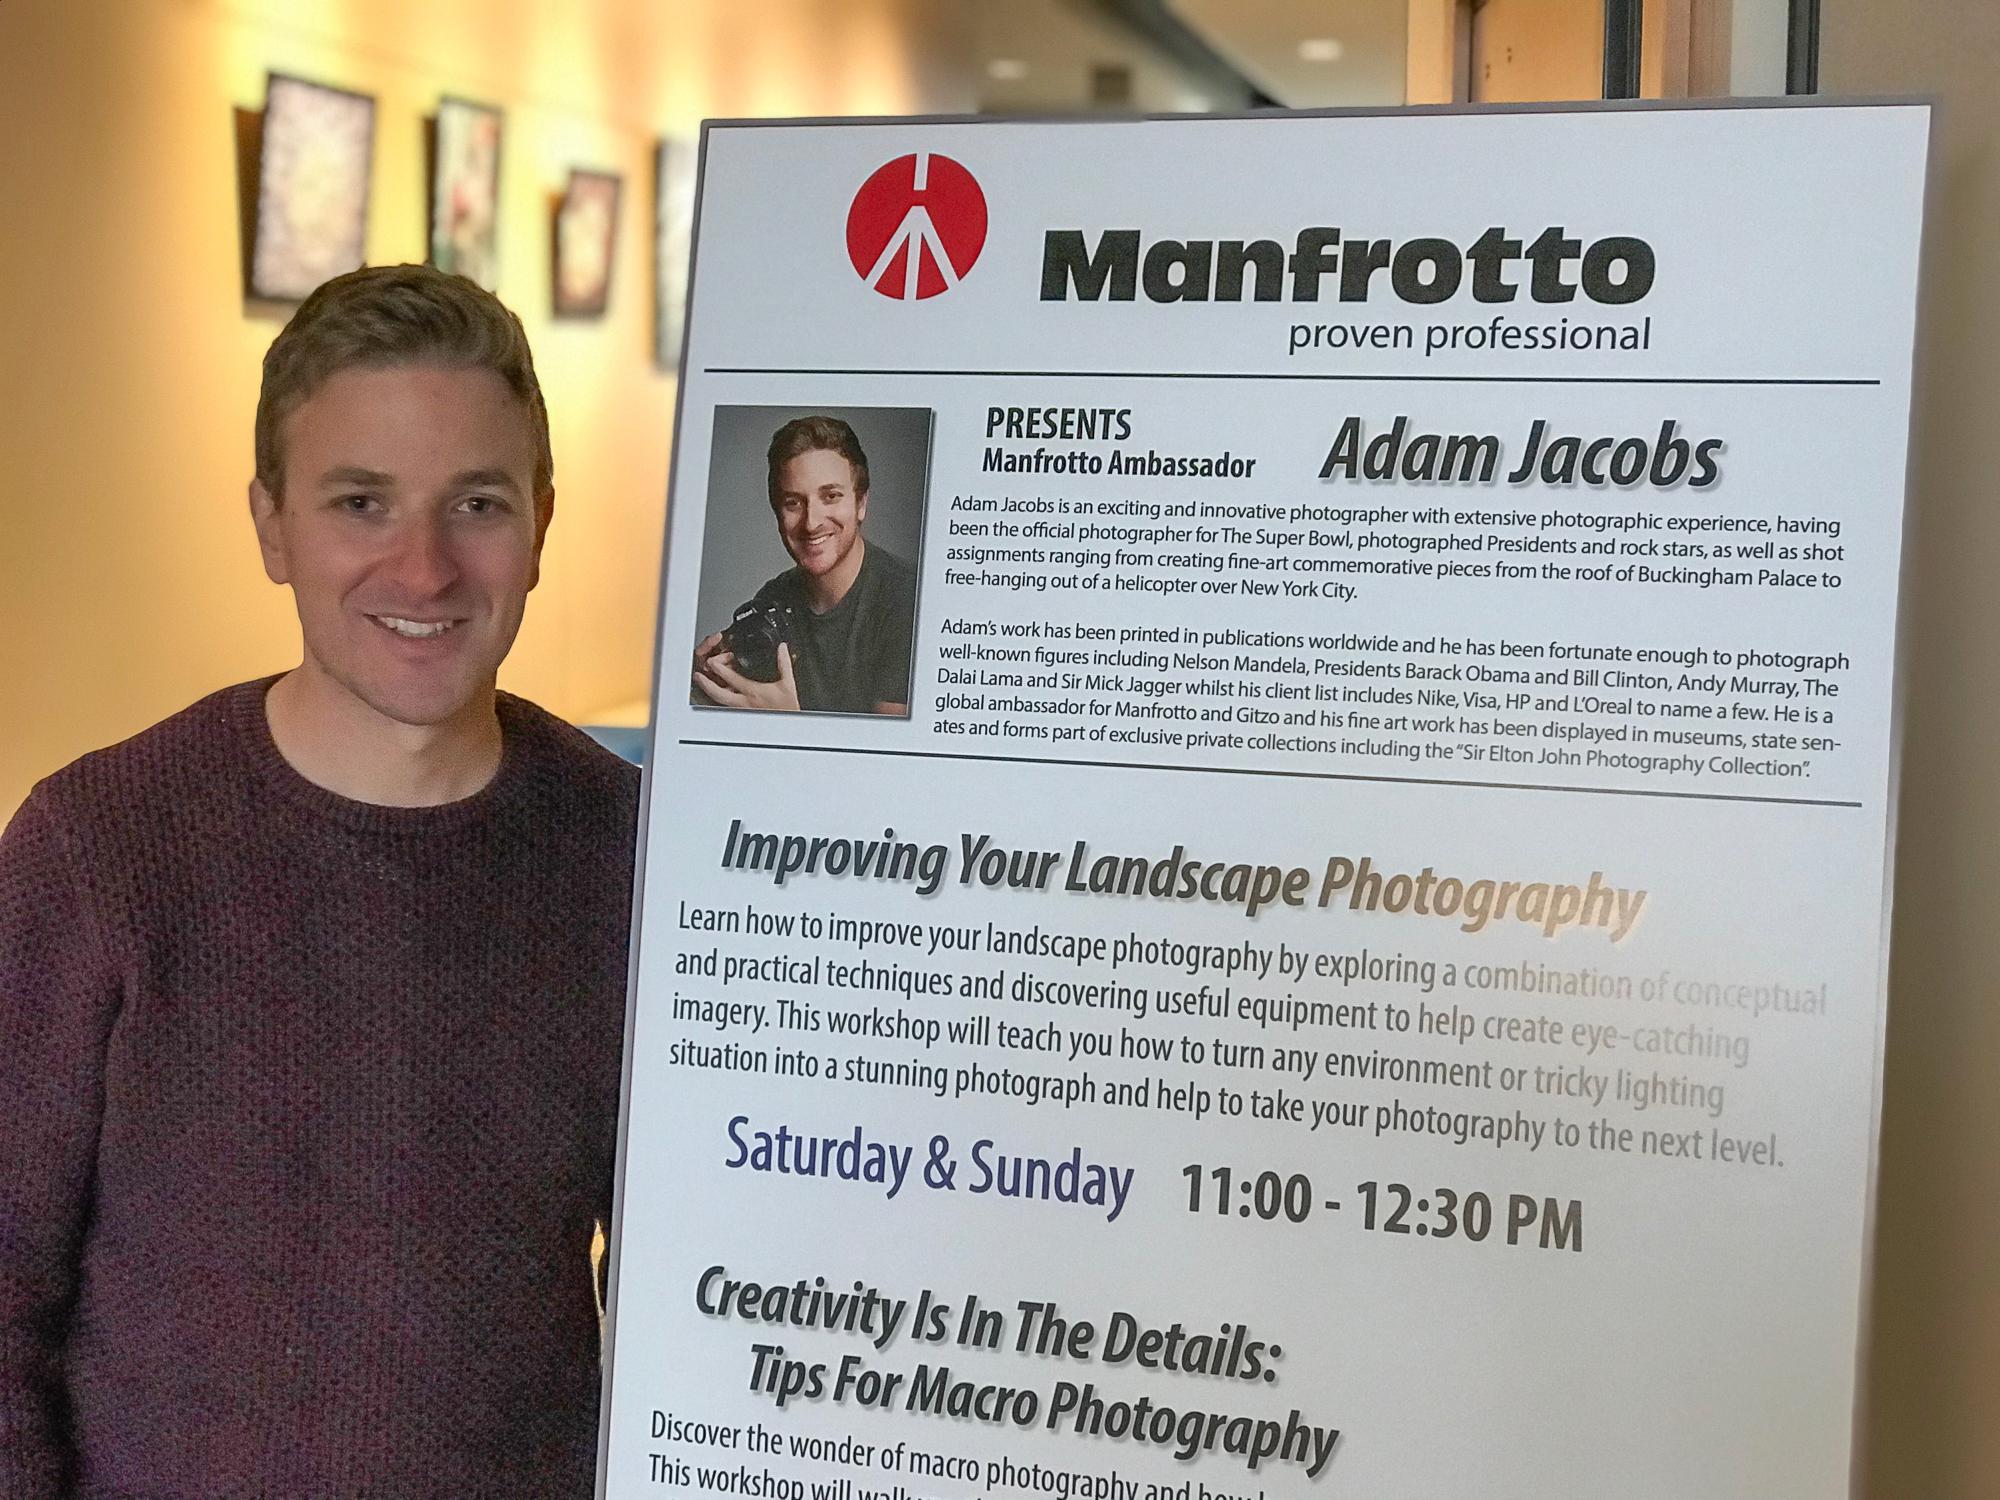 Adam Jacobs Photography Landscape Workshop Kenmore Camera Show Photos-3.jpg